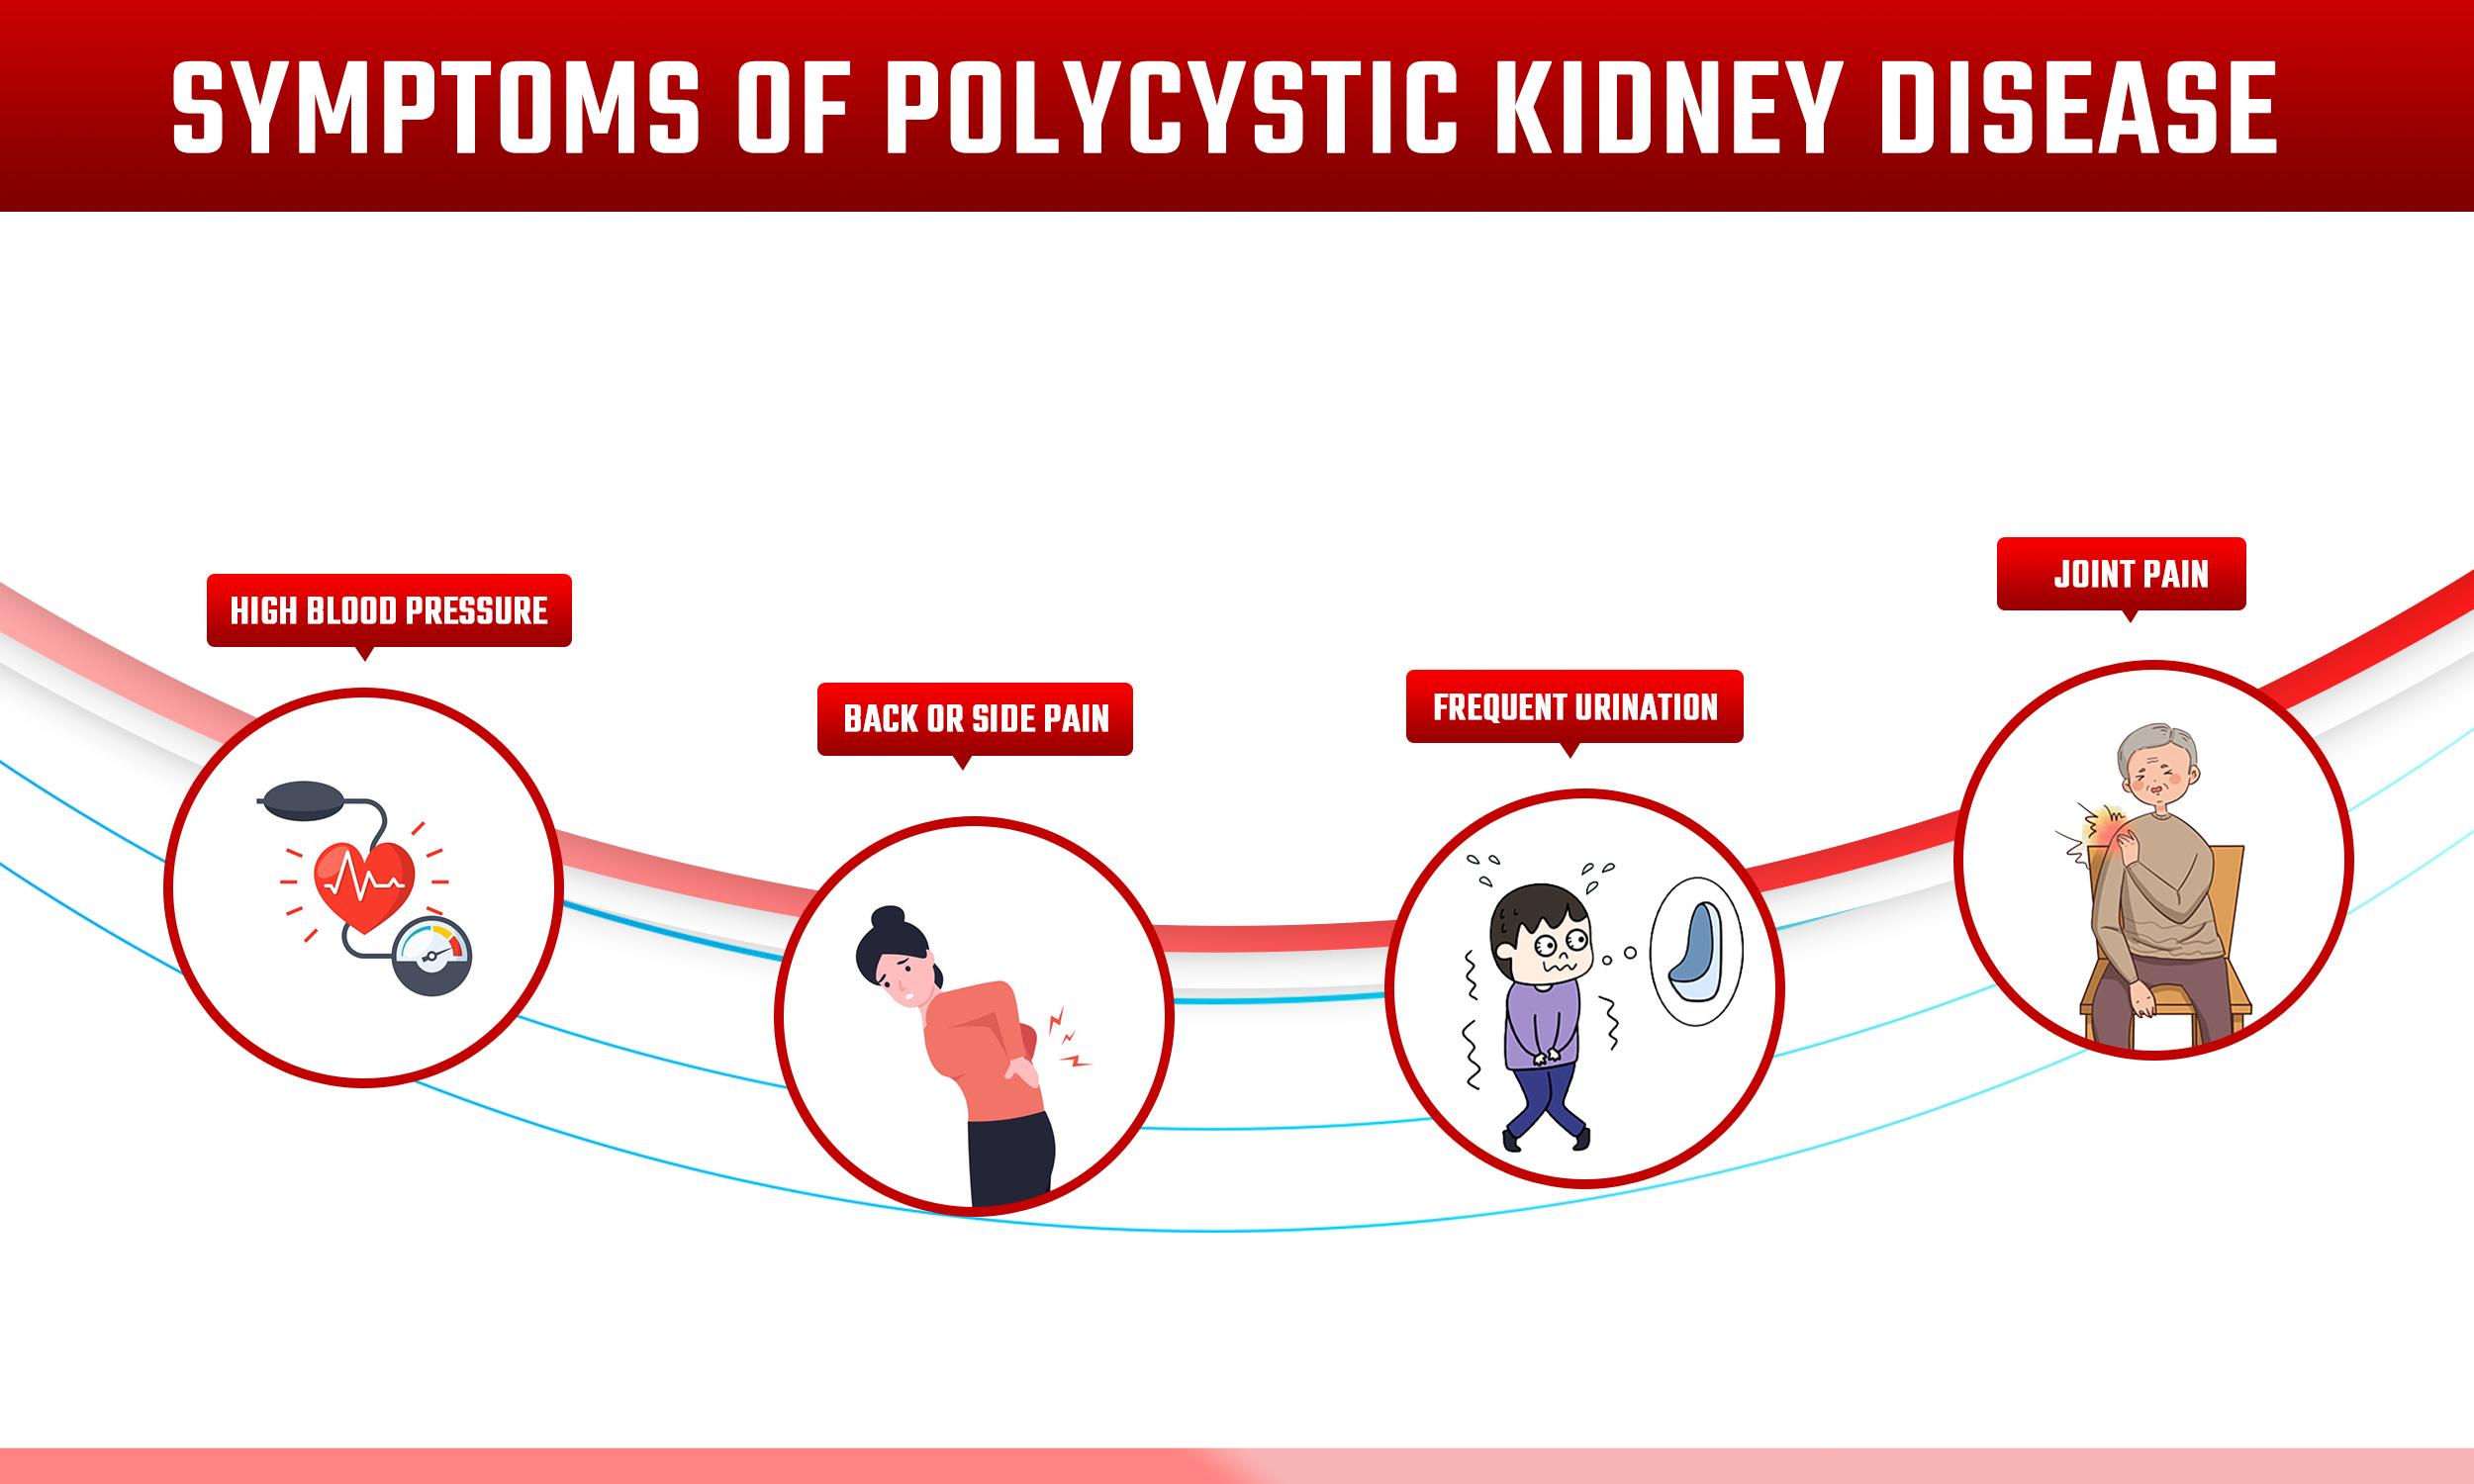 Symptoms_PolycysticKidneyDiseaseTreatment_sriaas.com